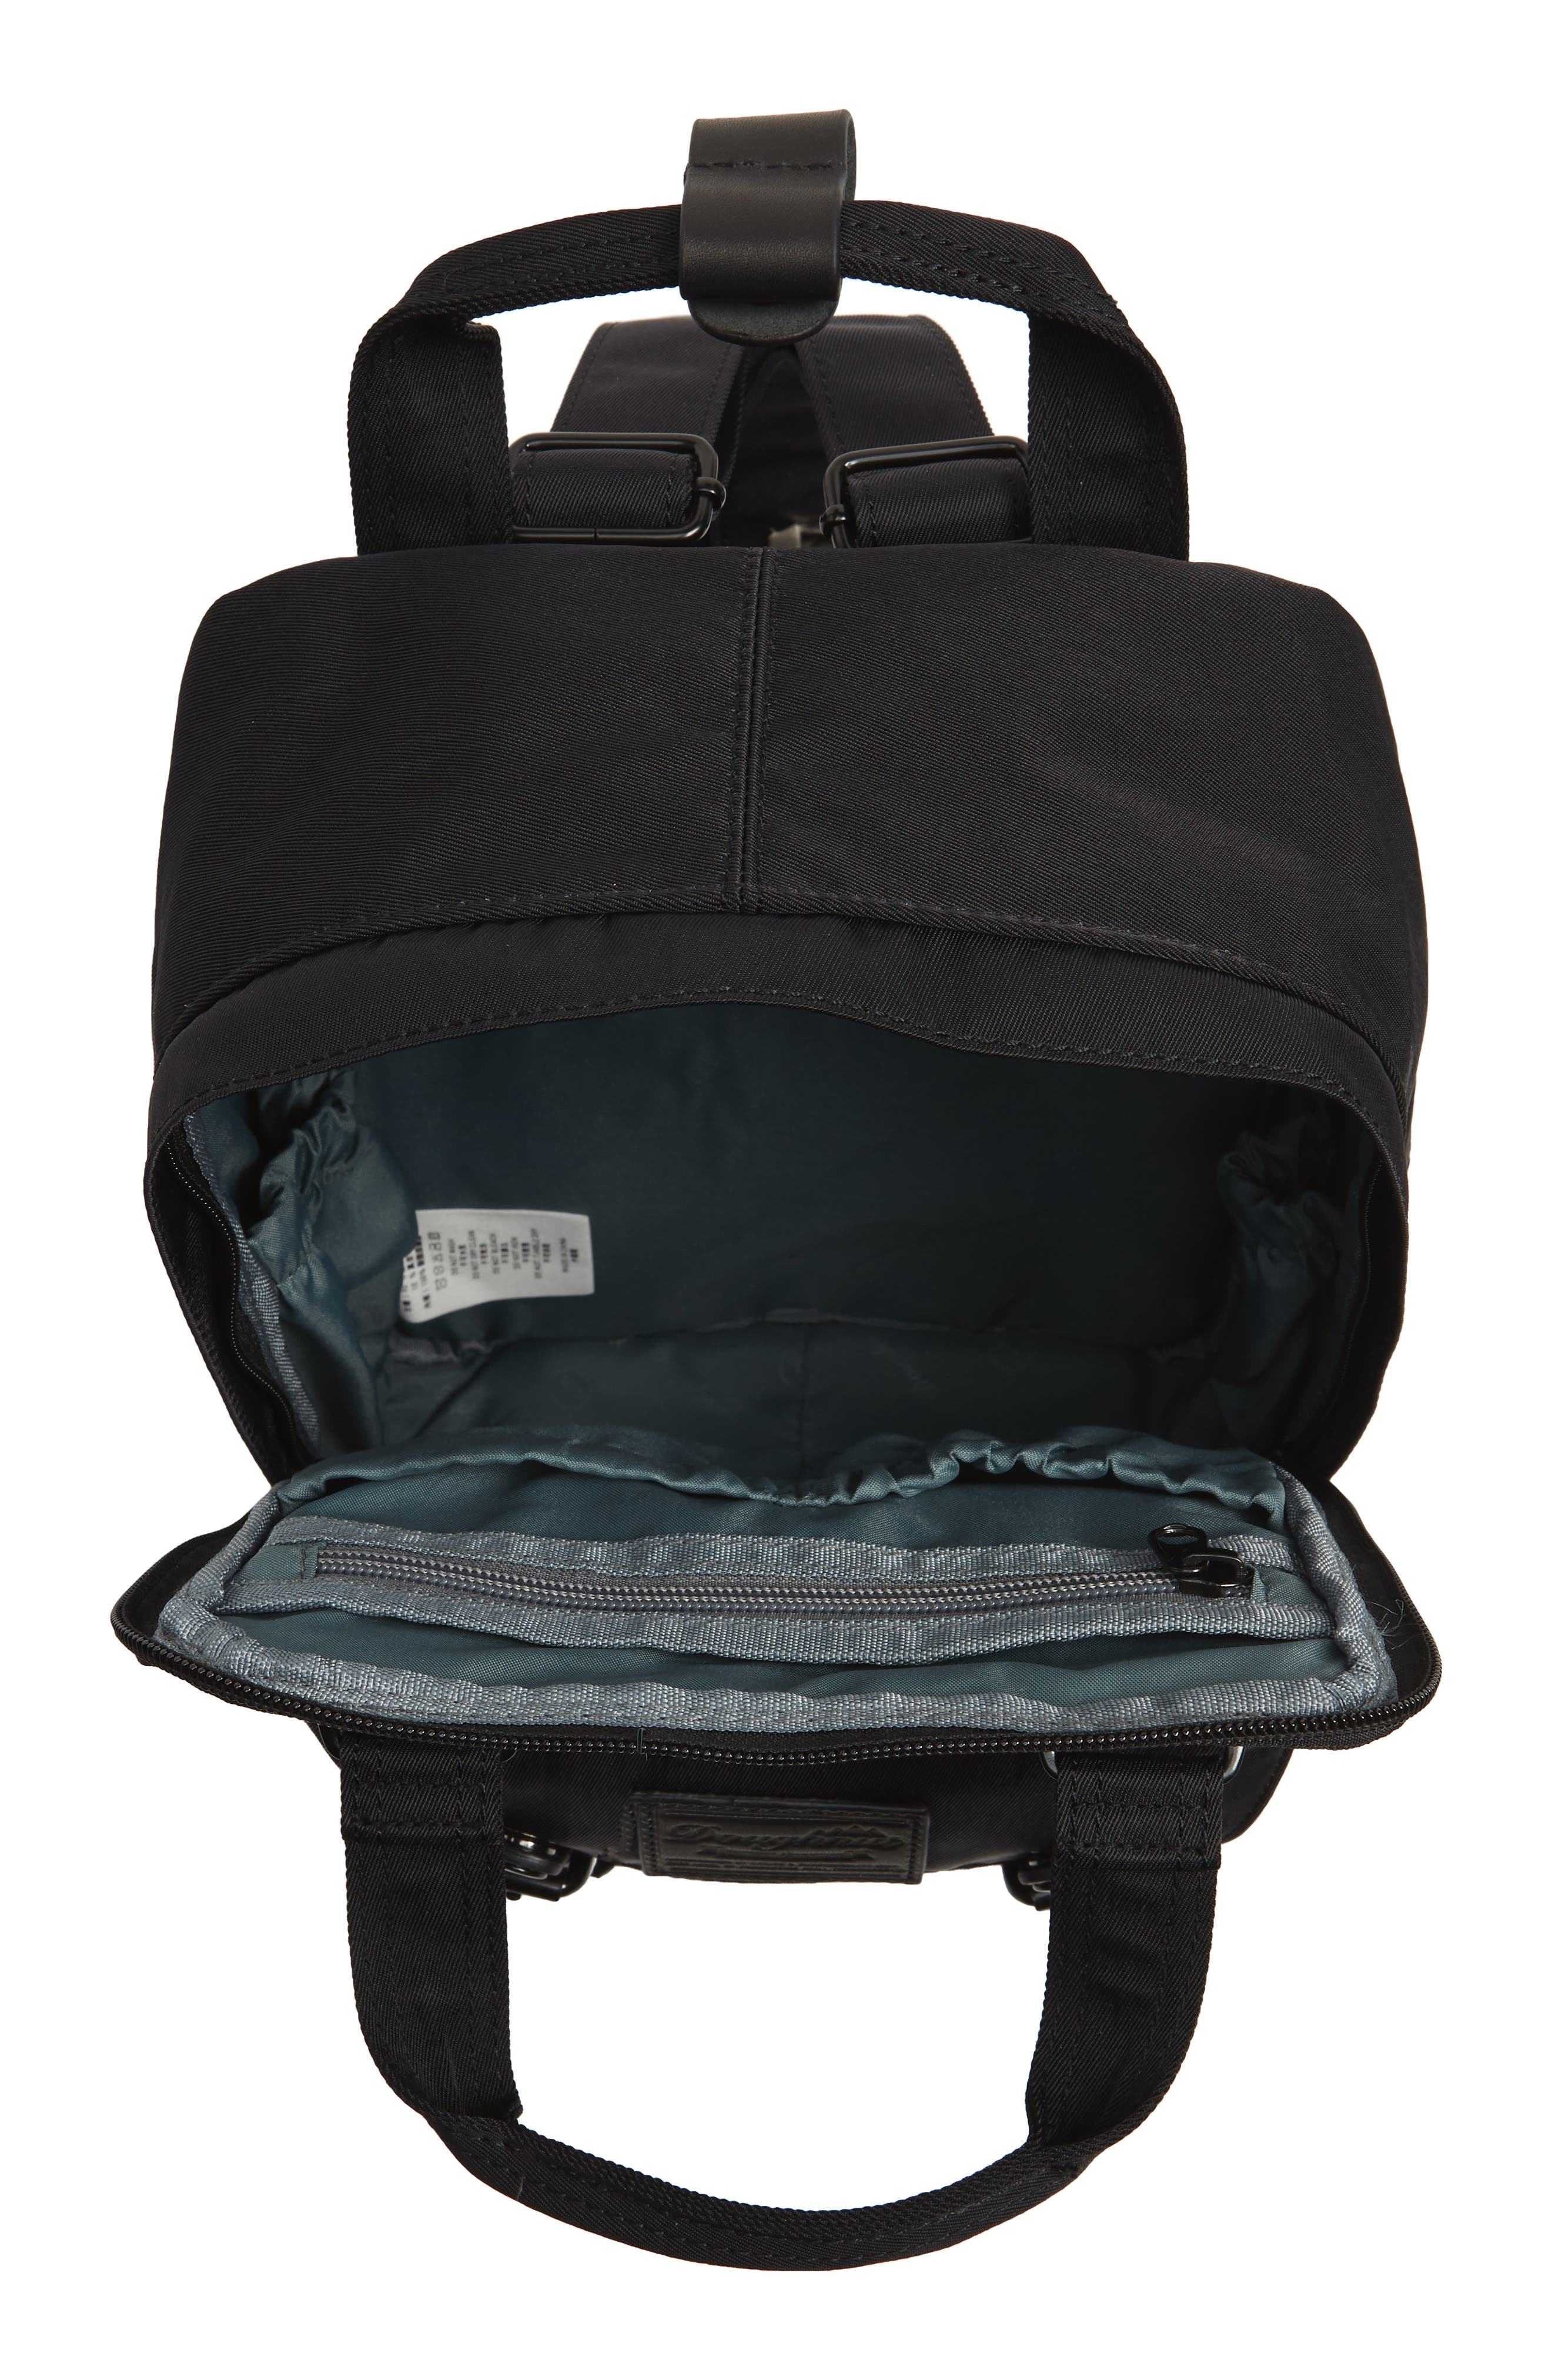 Mini Macaroon Black Series Water Resistant Backpack,                             Alternate thumbnail 6, color,                             Black